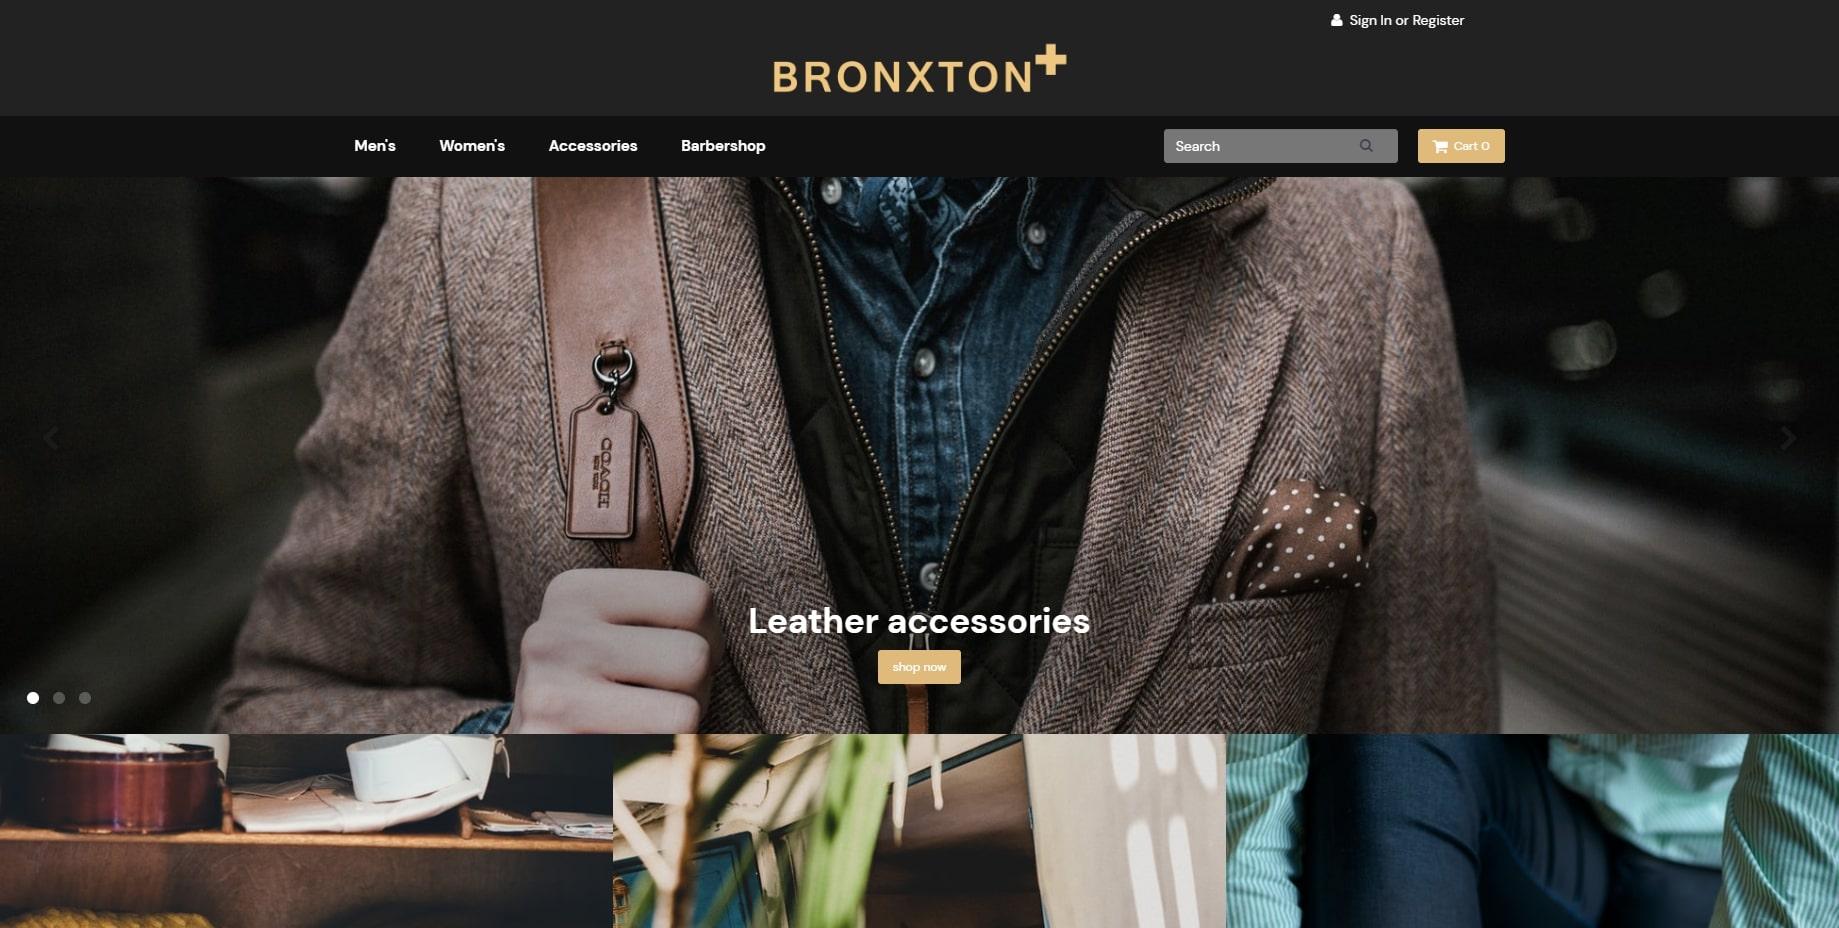 Bronxton